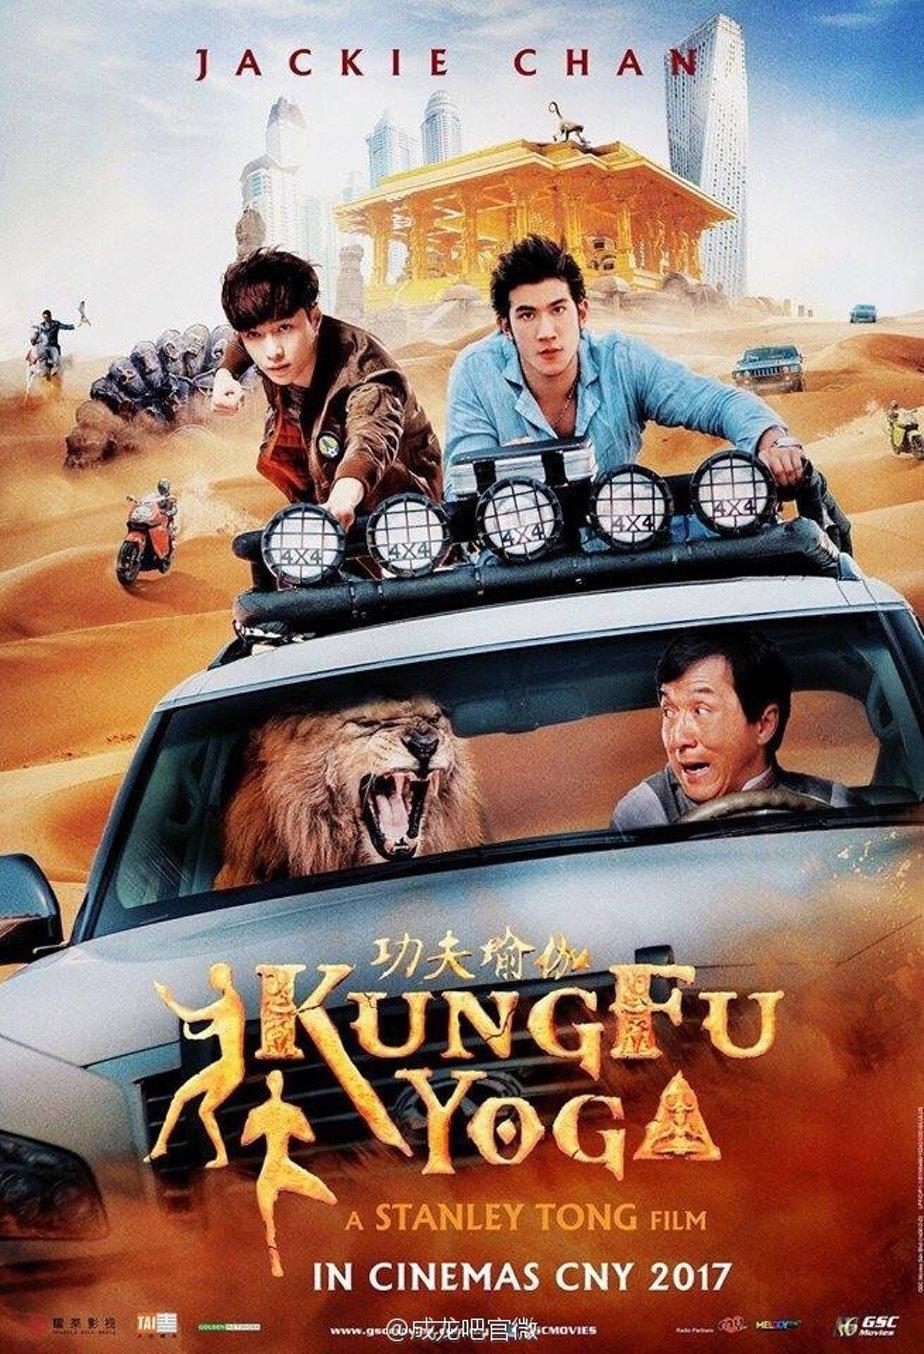 Kung Fu Yoga / Кунг-фу йога (2017) Безплатно гледане